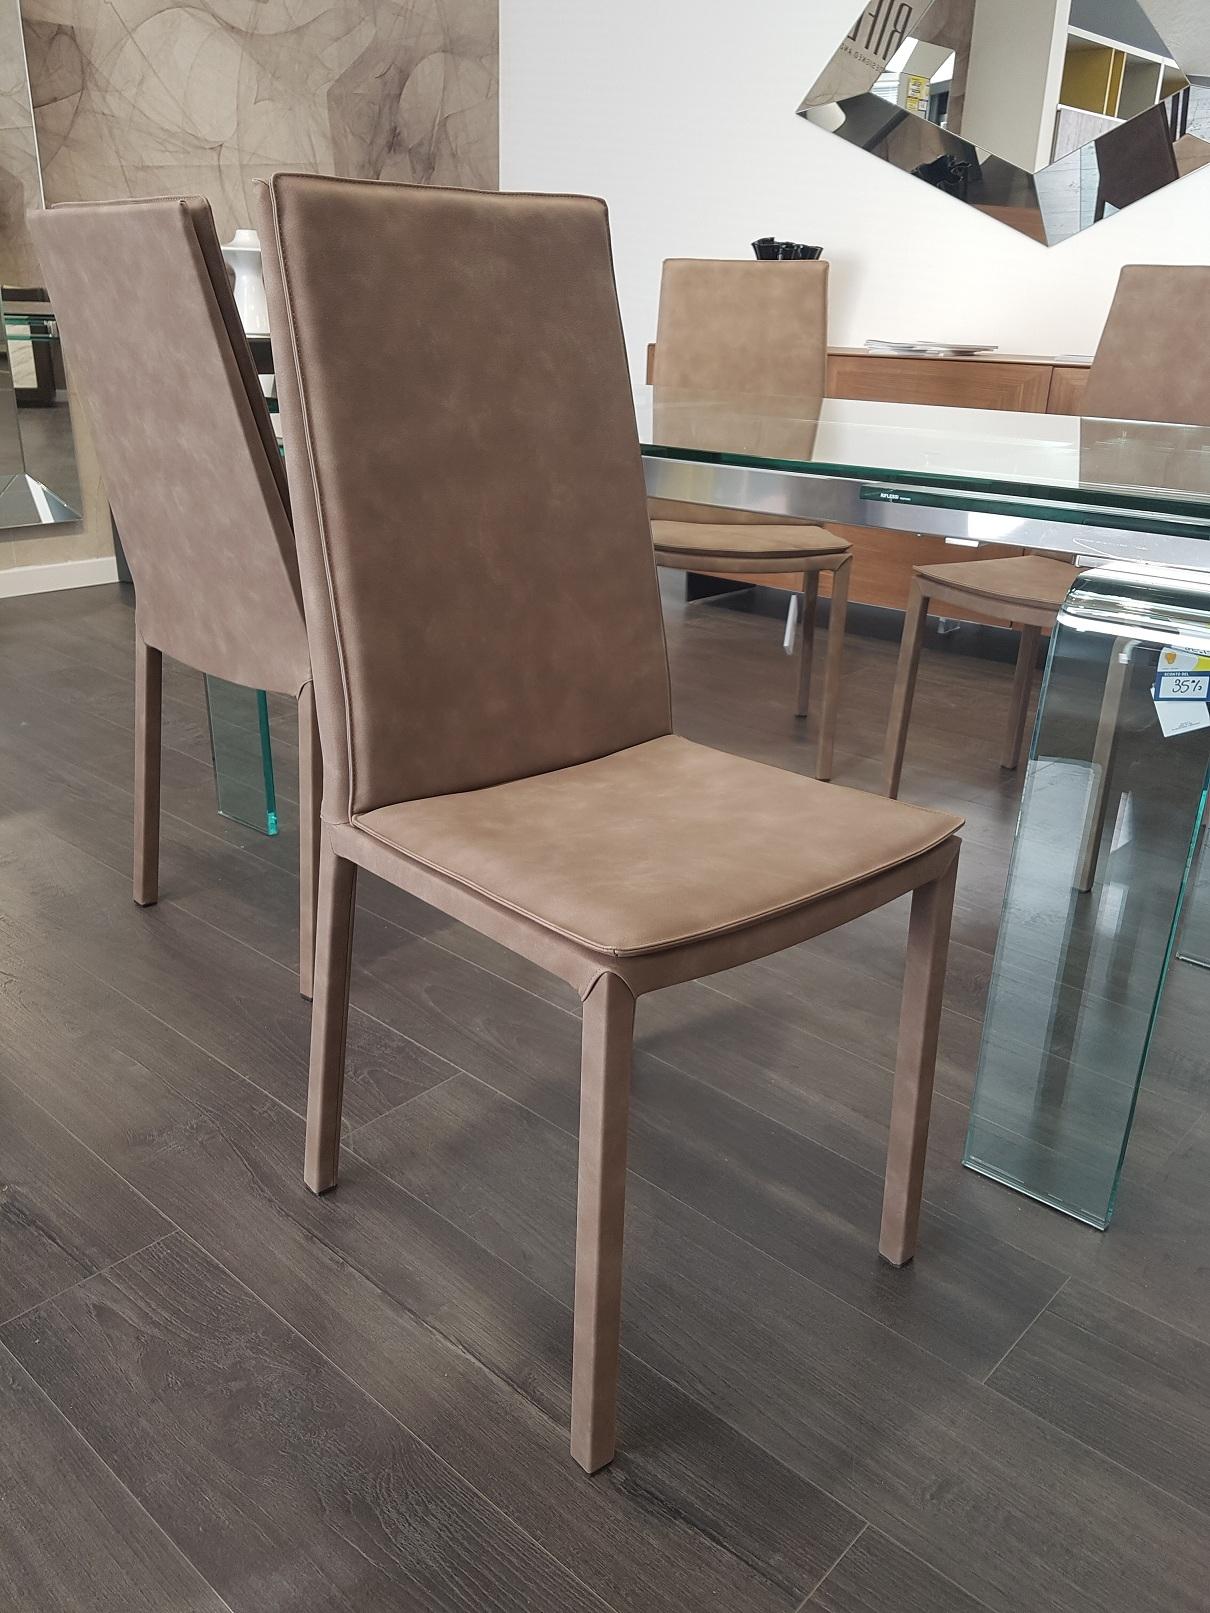 Sedia riflessi sveva pelle moderno sedie a prezzi scontati for Outlet sedie roma